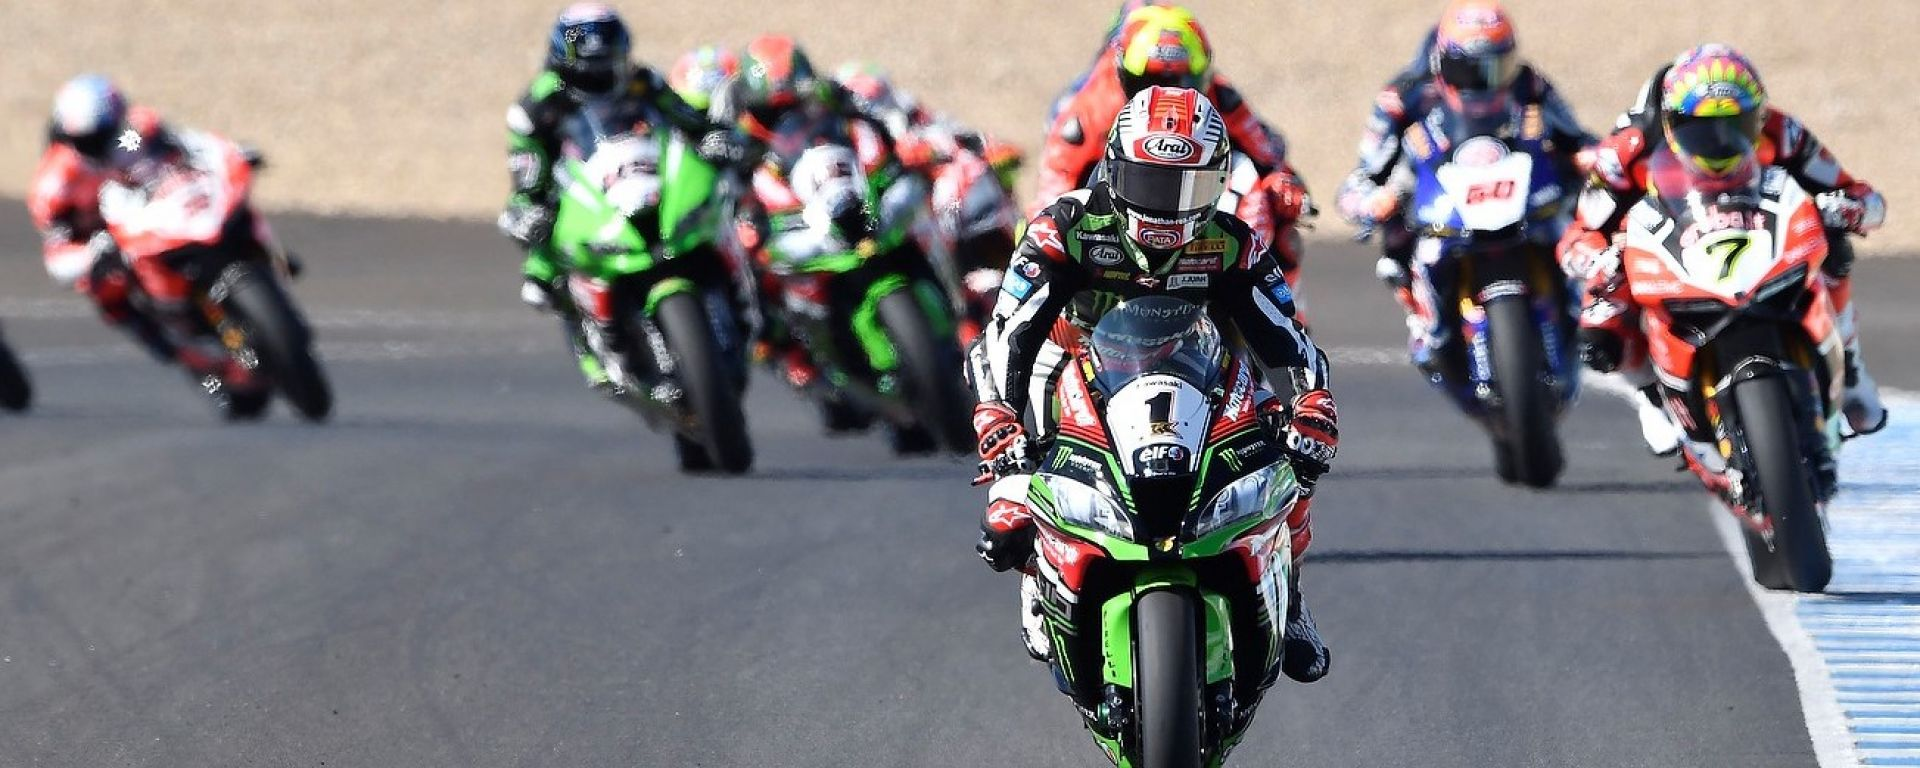 Team e Piloti Superbike: la lista completa